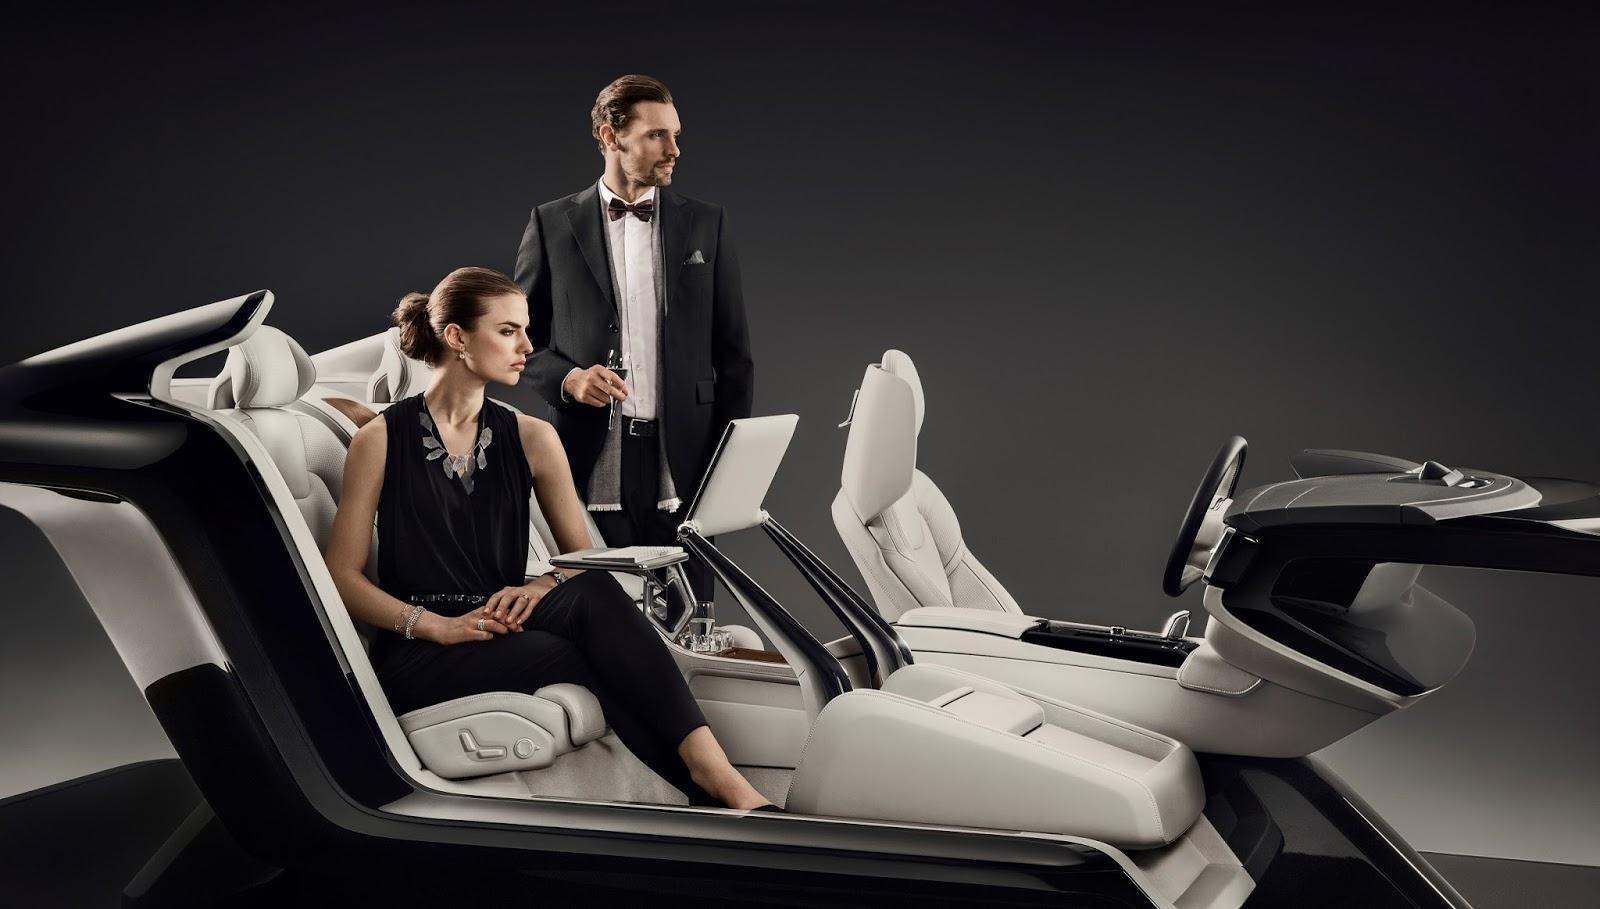 VOLVO2BS902BEXCELLENCE2BCONCEPT 2 Το Νέο Volvo S90 ήταν ο μεγάλος guest star στο συνέδριο ηγεσίας της ΕΑΣΕ Luxury, Luxury sedan, sedan, Volvo, Volvo S90